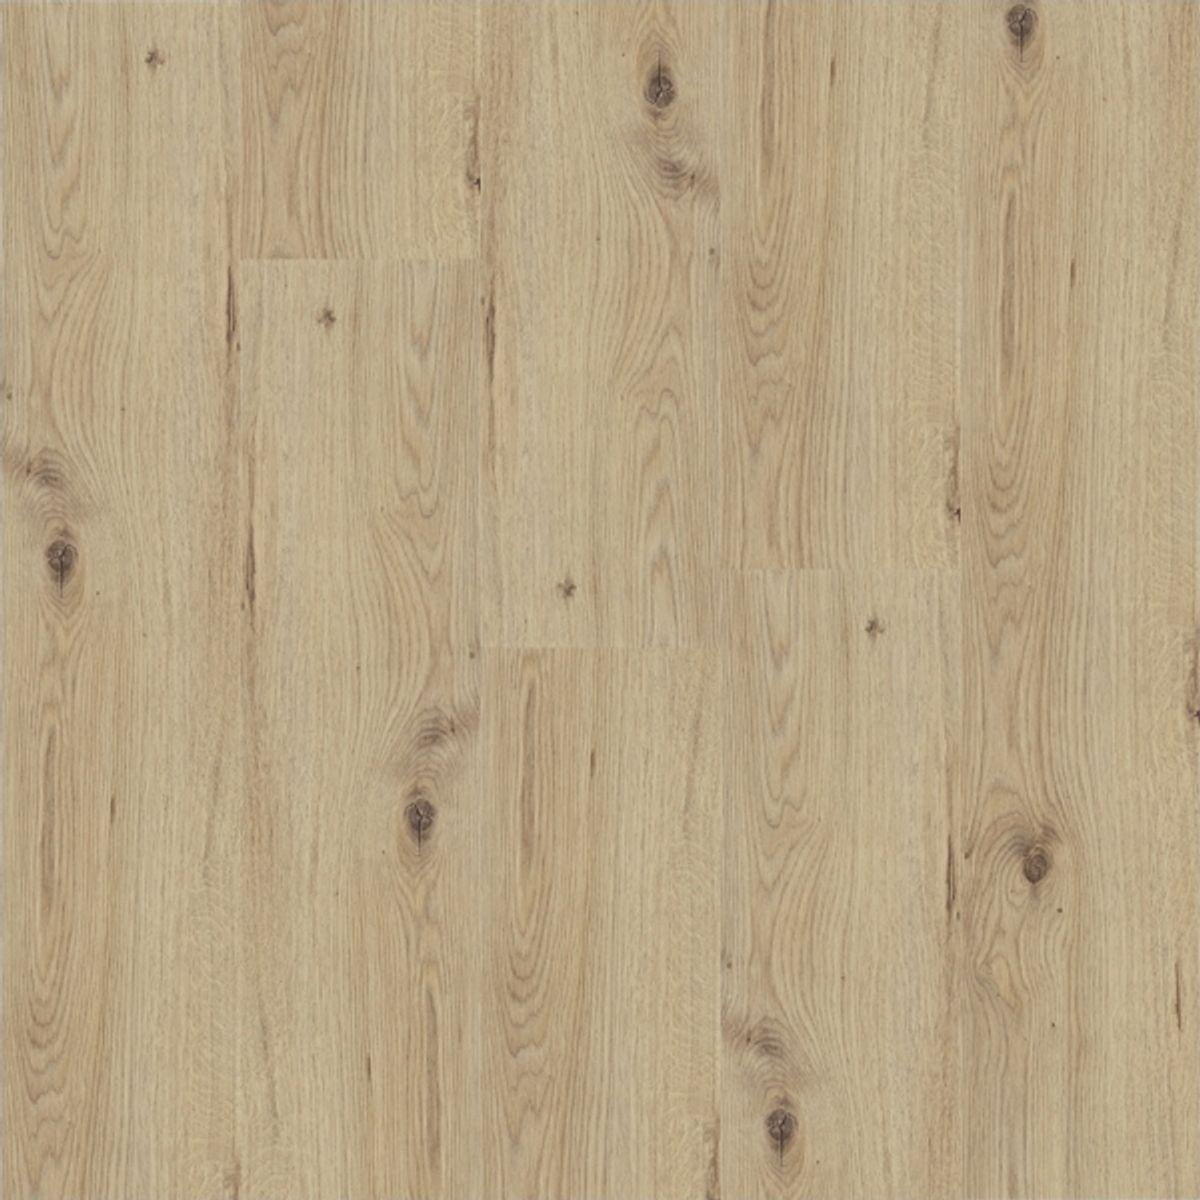 Stratifié chêne naturel blond 7mm Ottawa